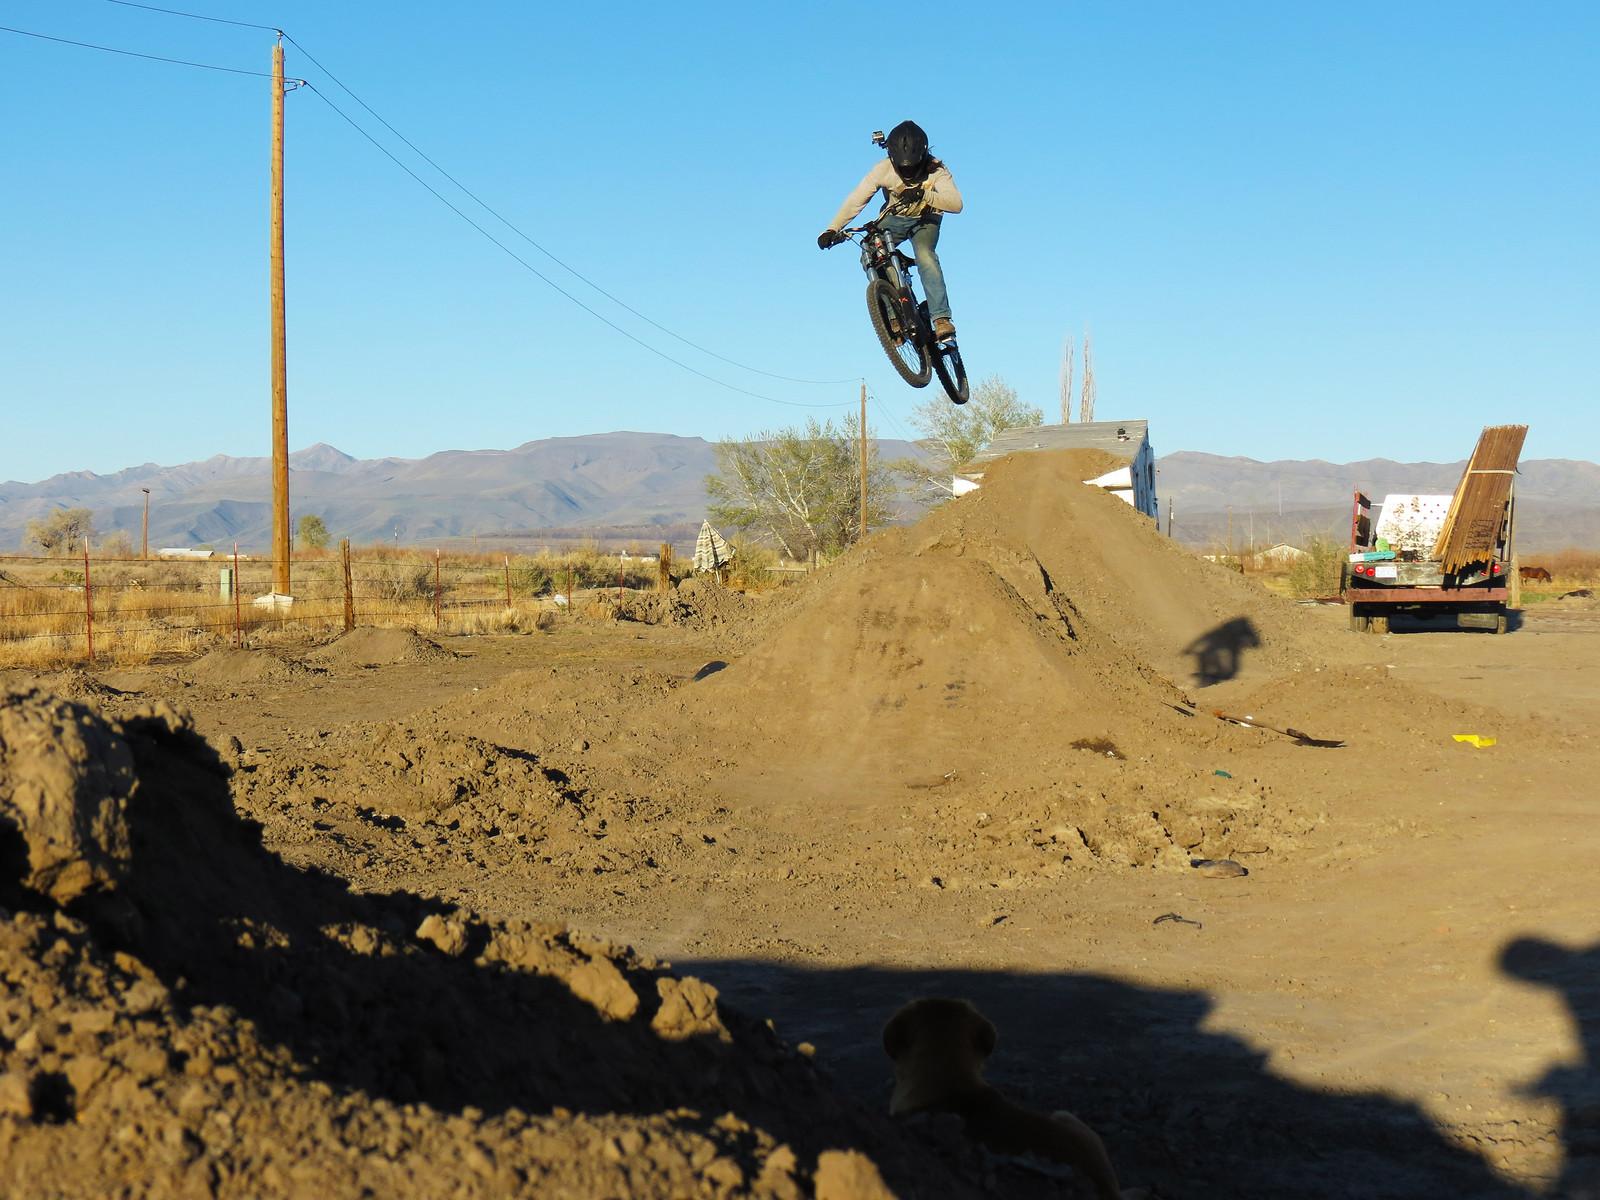 cim whipz 1 - Moosey - Mountain Biking Pictures - Vital MTB